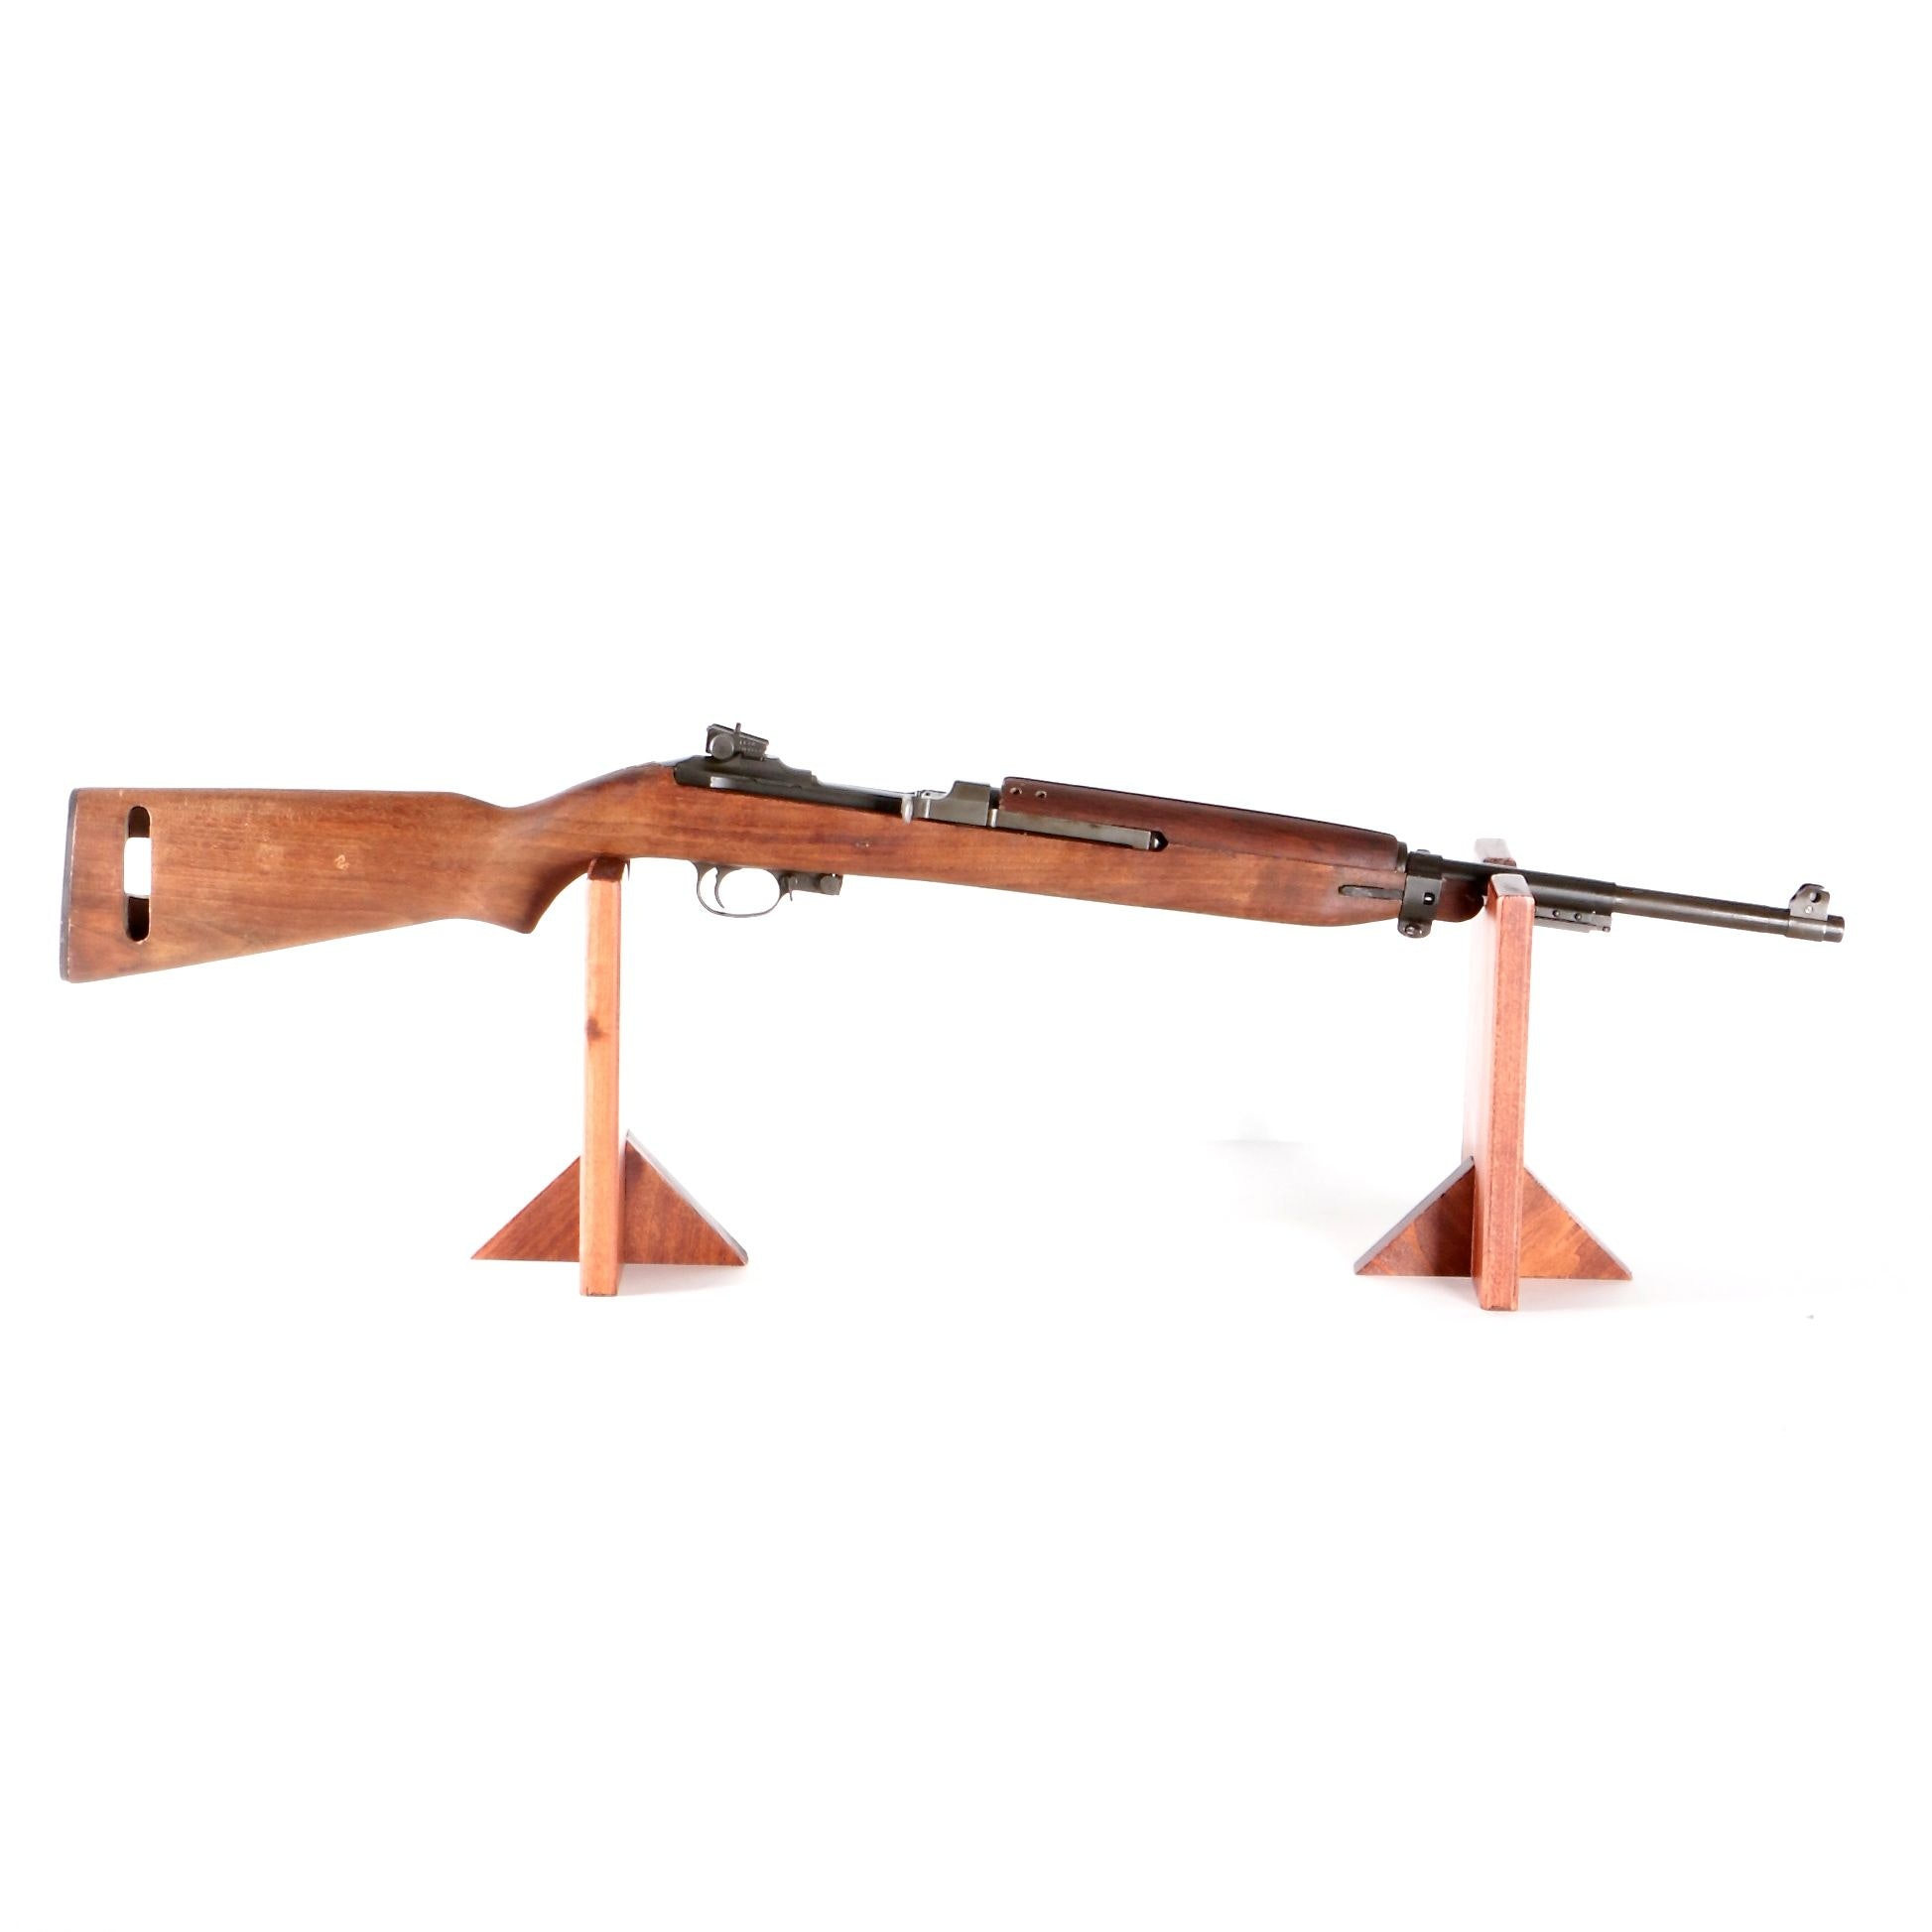 World War II Era .30 Caliber Semi-Automatic M1 Carbine